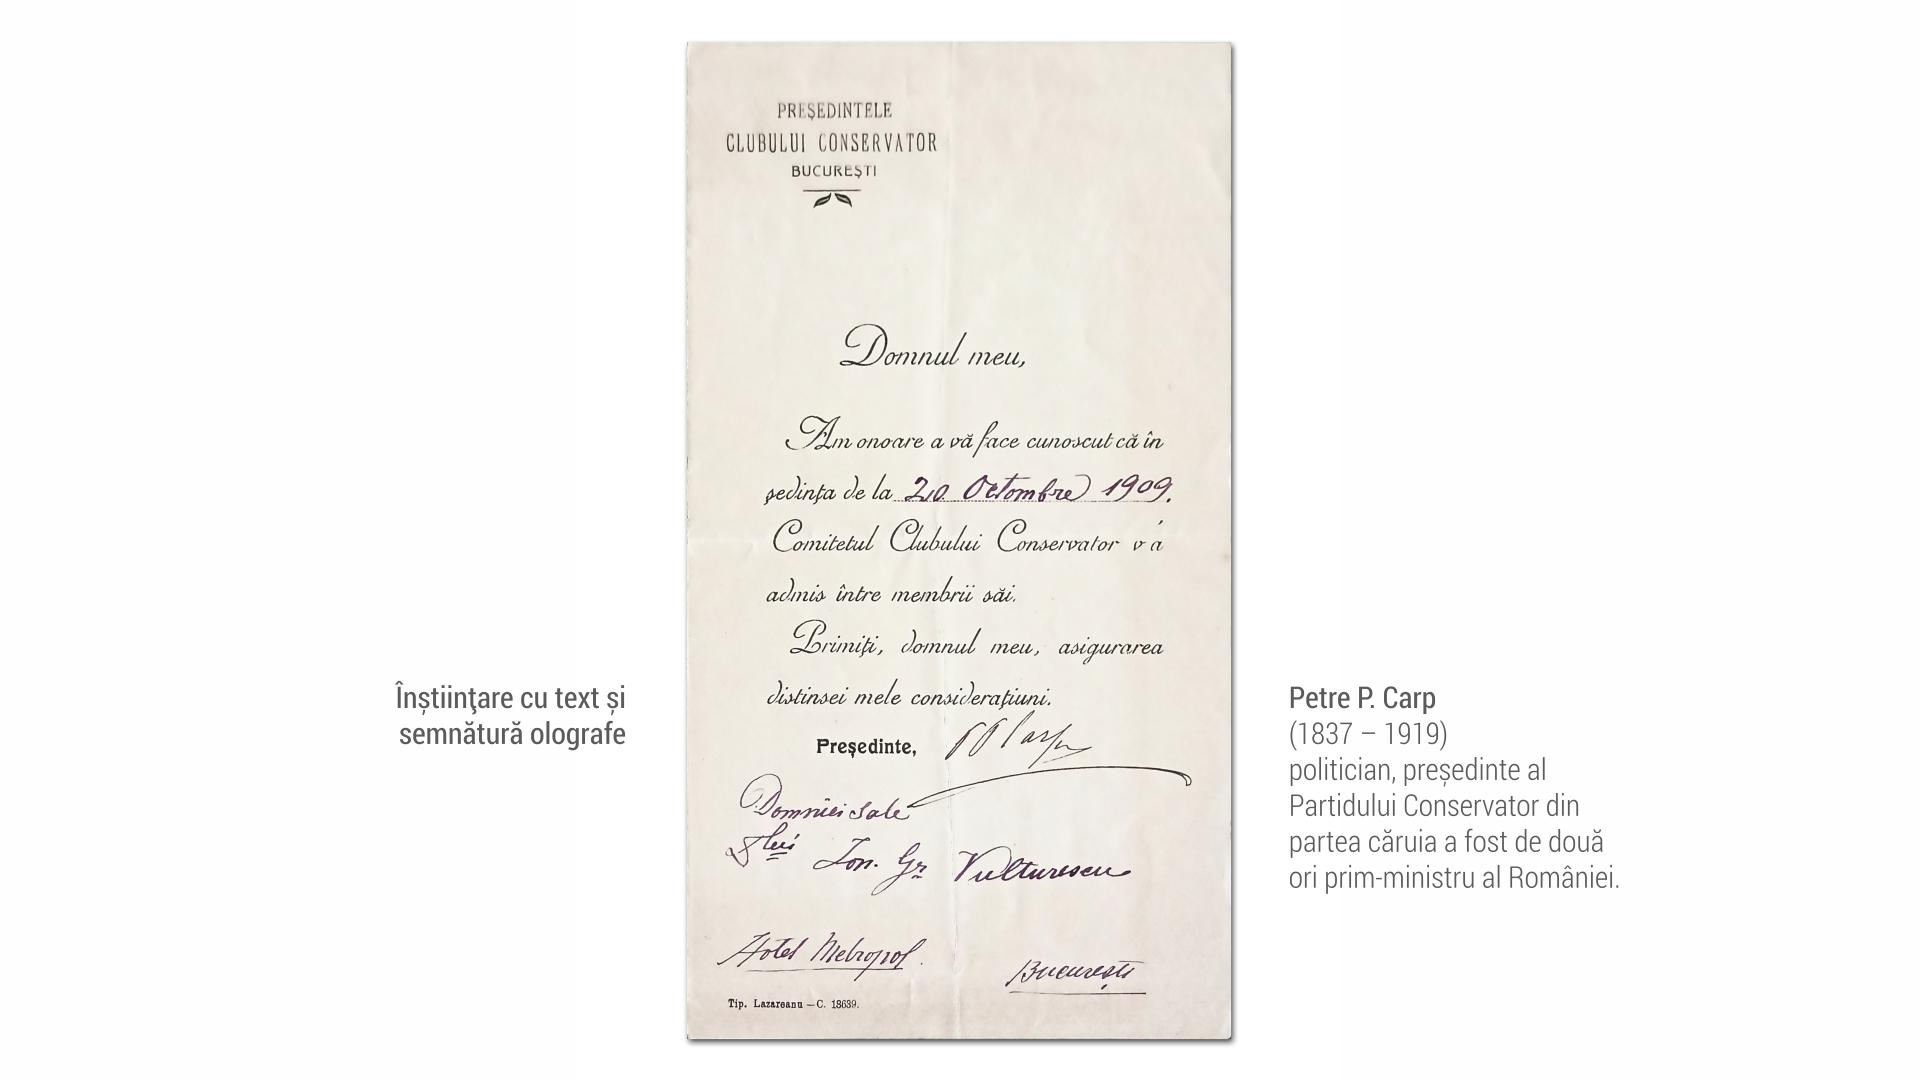 1837 P P Carp - instiintare